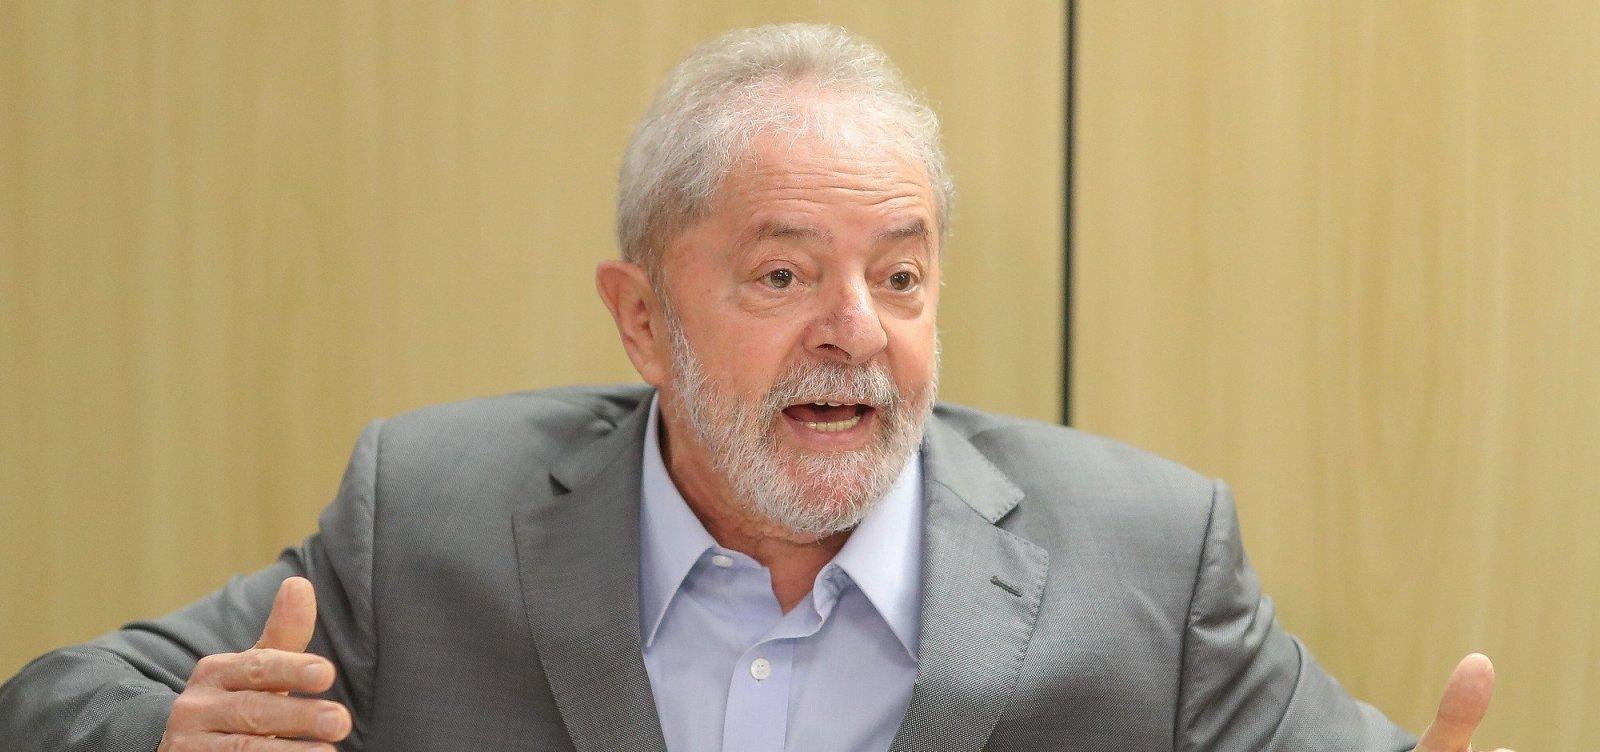 ['País pariu essa coisa chamada Bolsonaro', diz Lula]